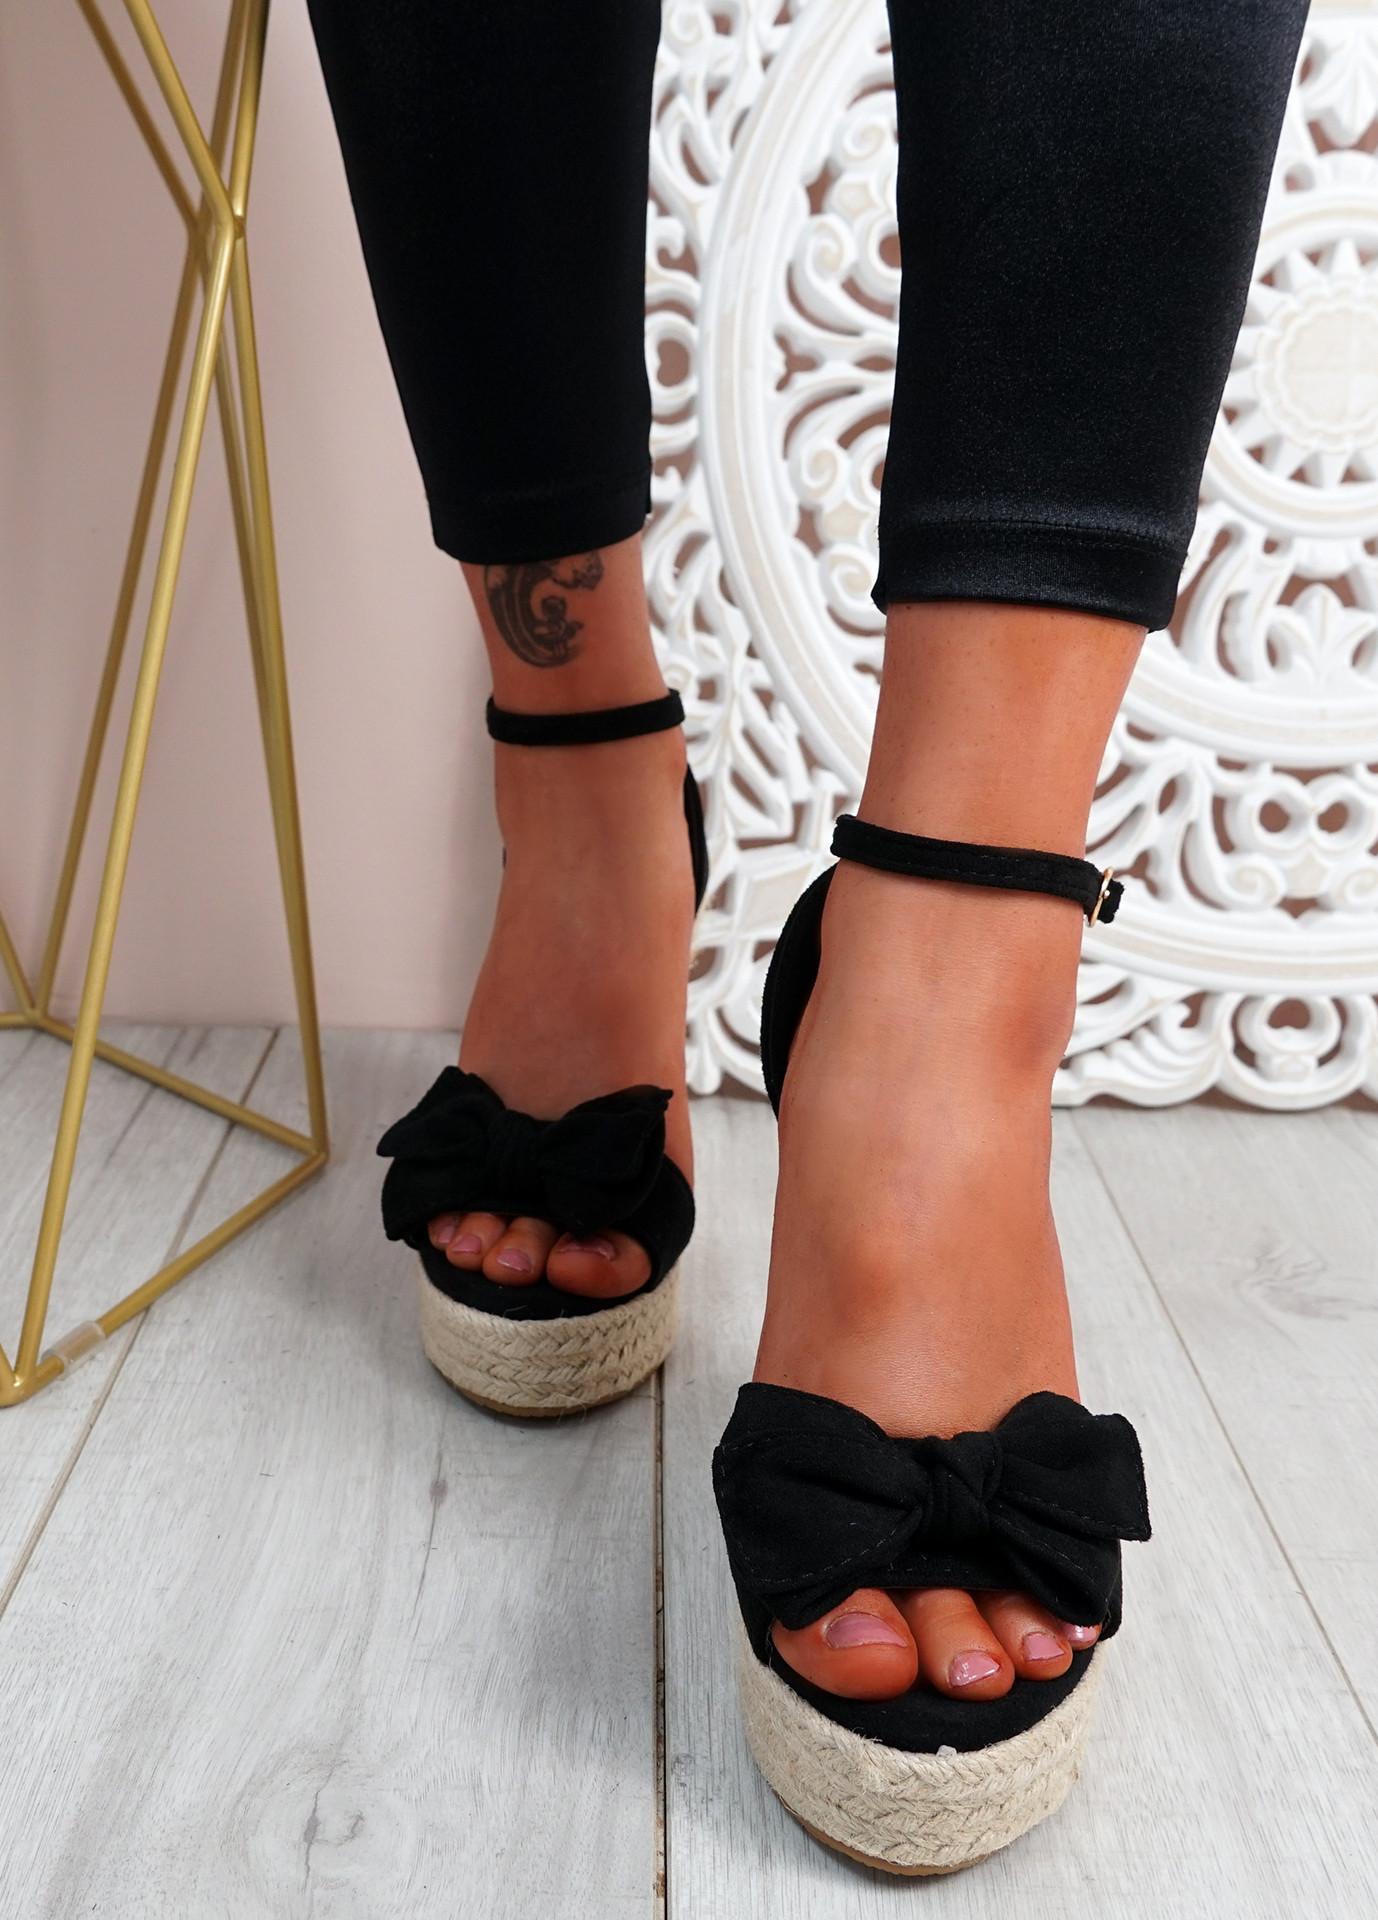 Norro Black High Heel Wedge Sandals